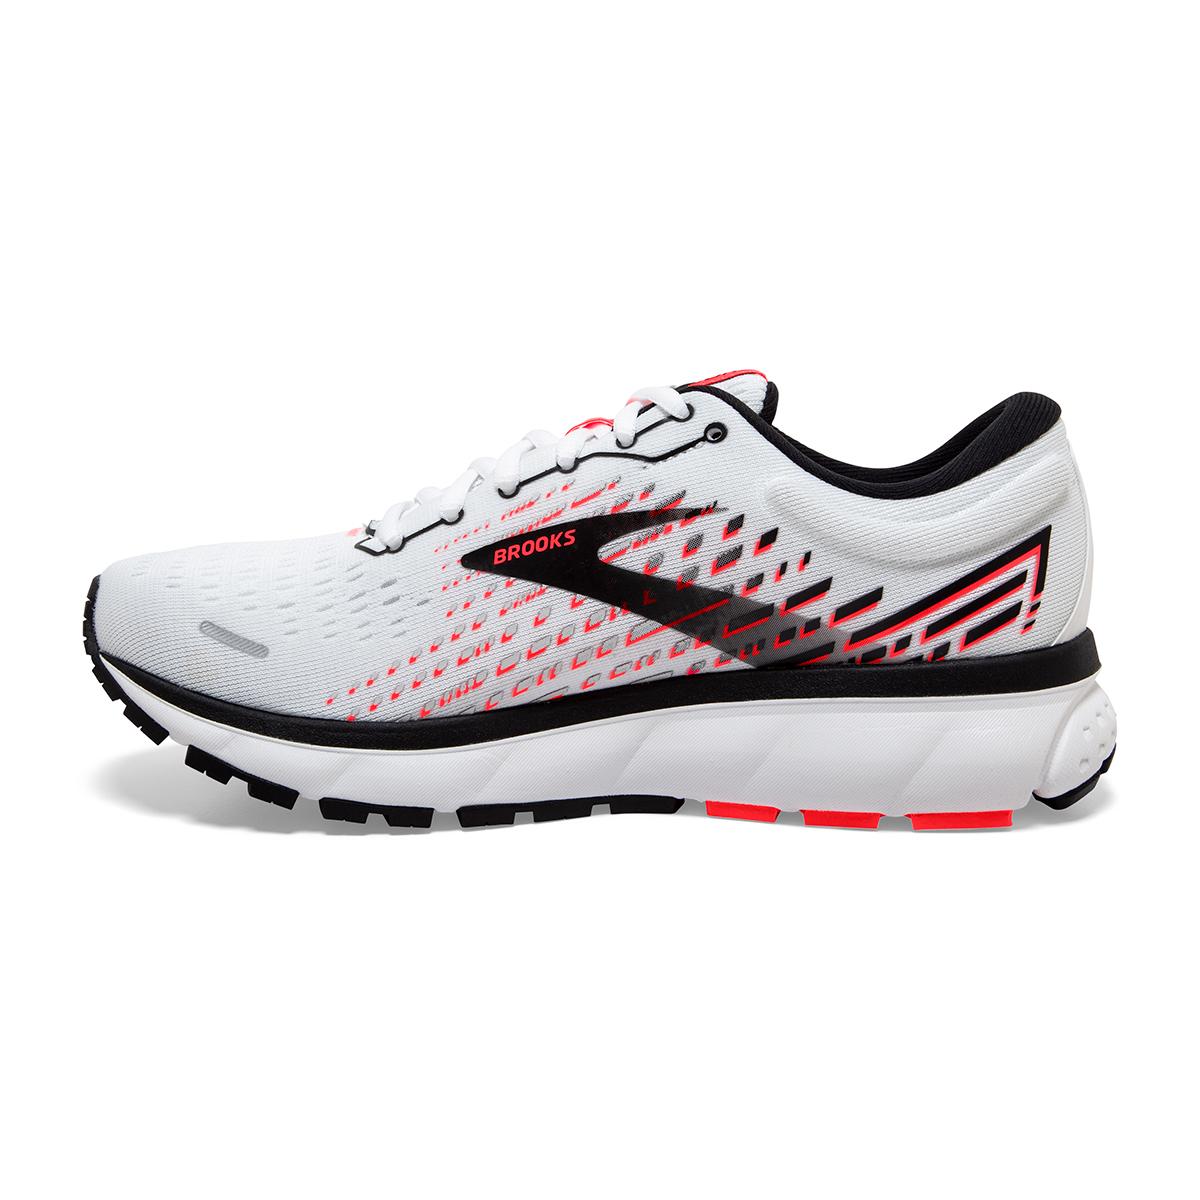 Women's Brooks Ghost 13 Running Shoe - Color: White/Pink/Black - Size: 5 - Width: Regular, White/Pink/Black, large, image 5